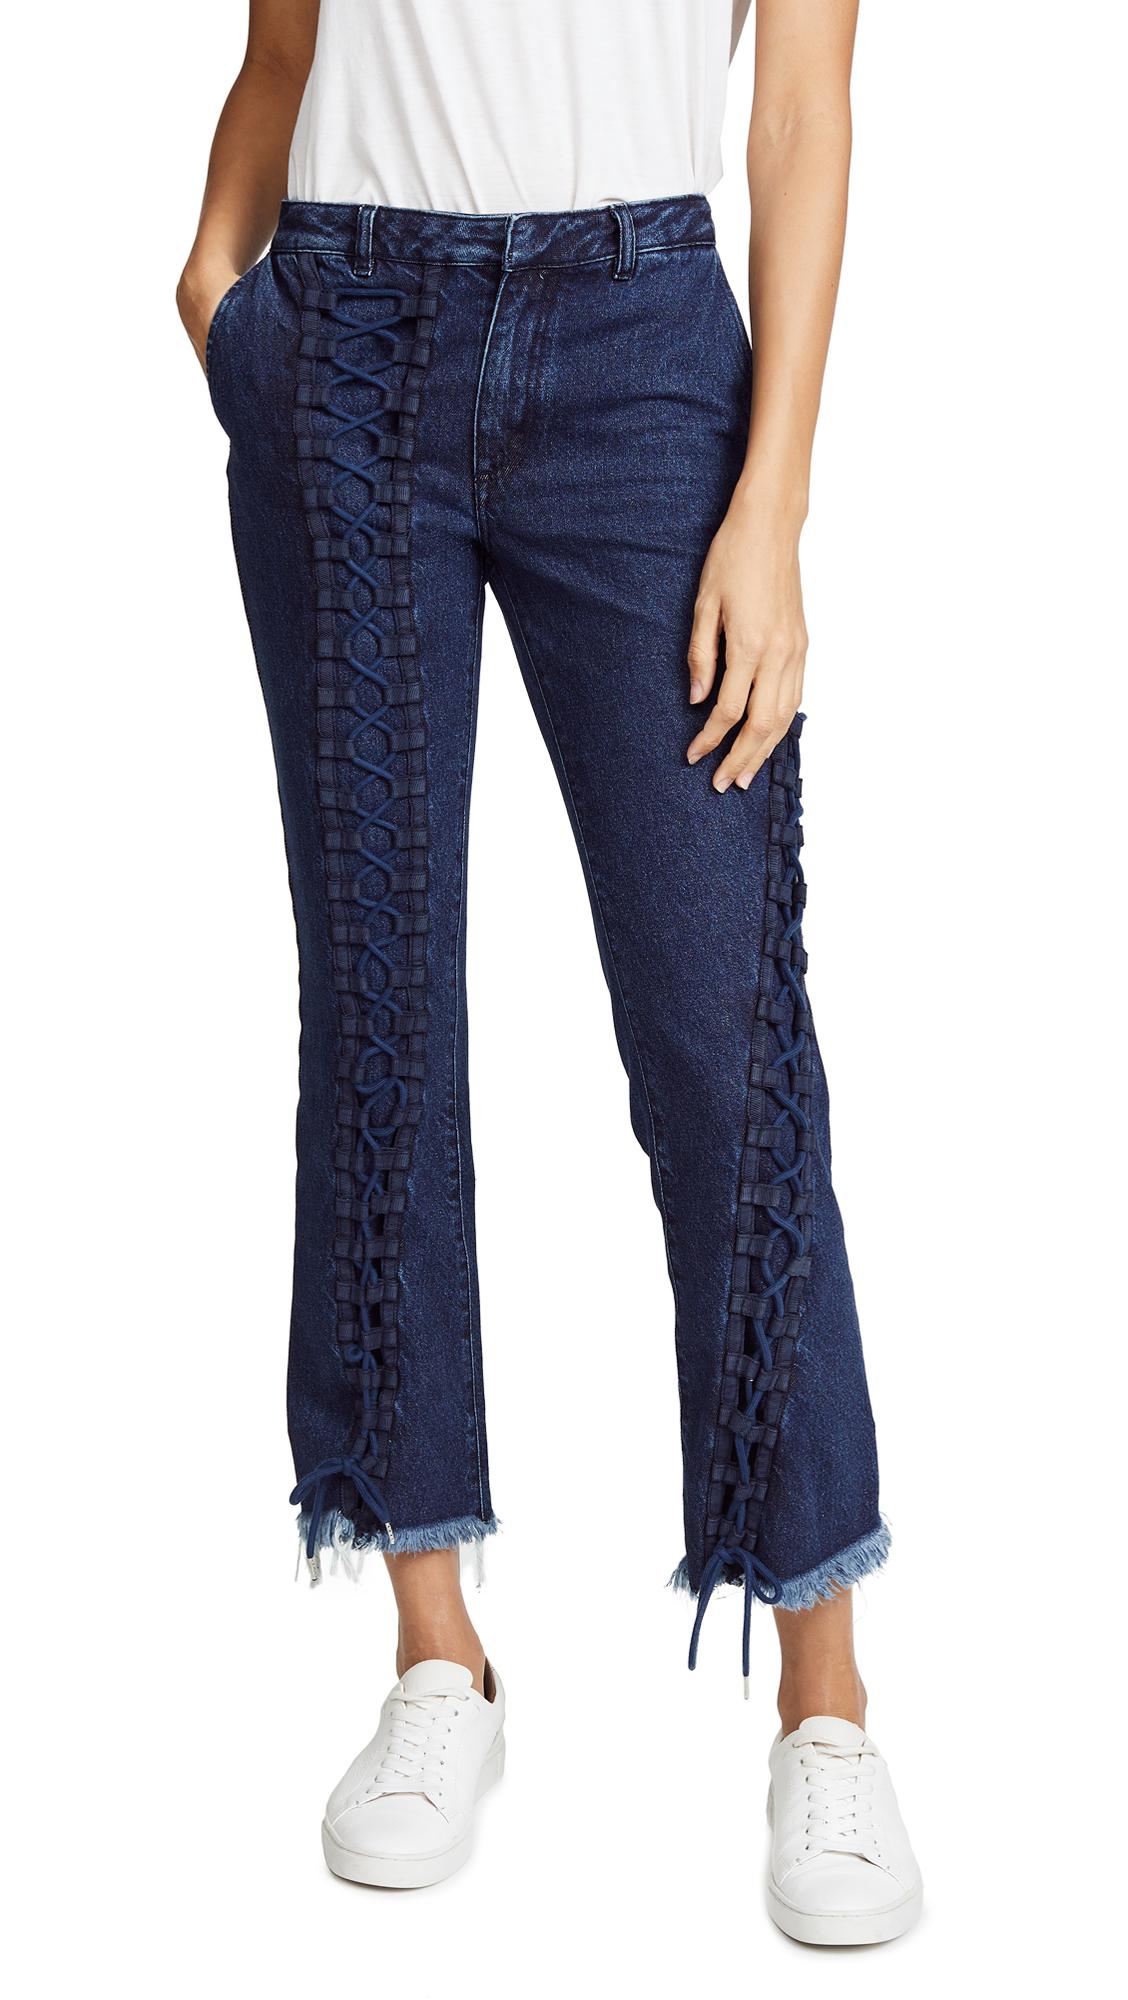 Marques Almeida Lace Up Jeans In Indigo